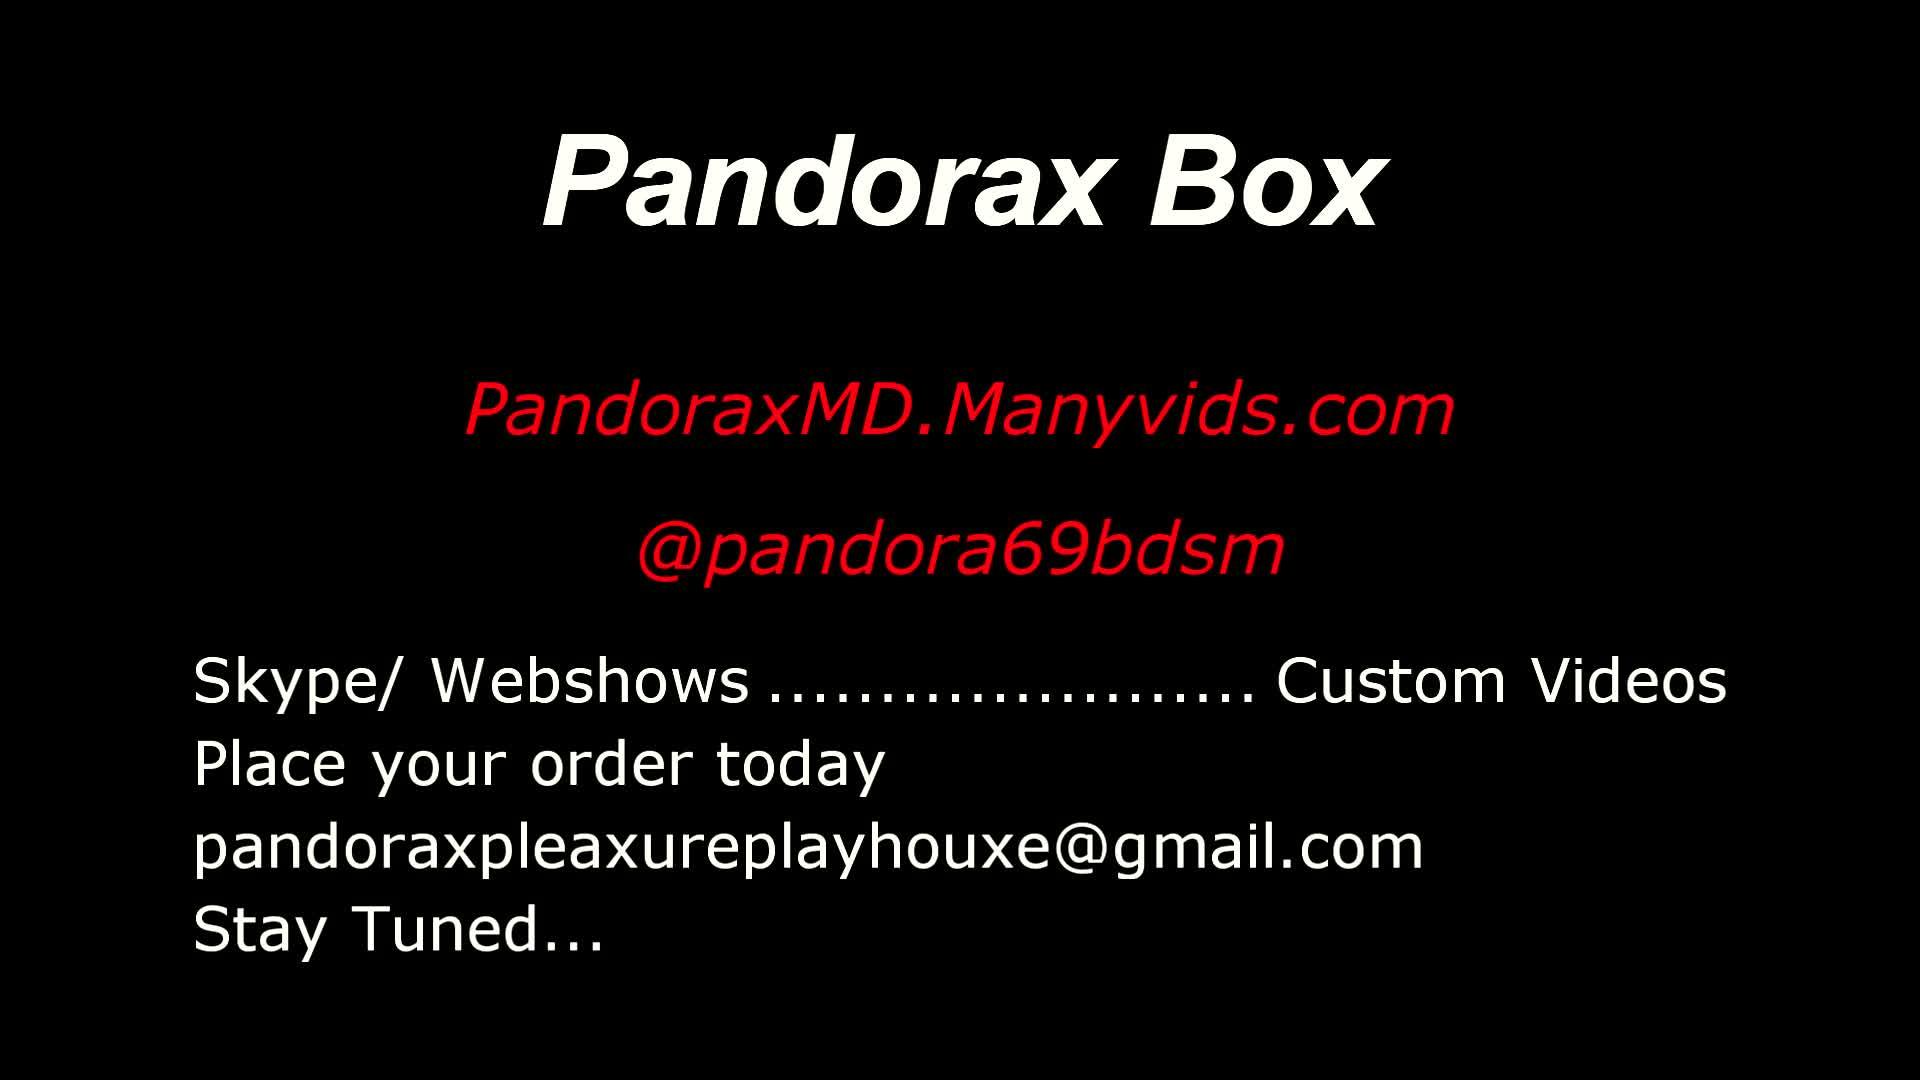 PandoraxBoxMD'd vid